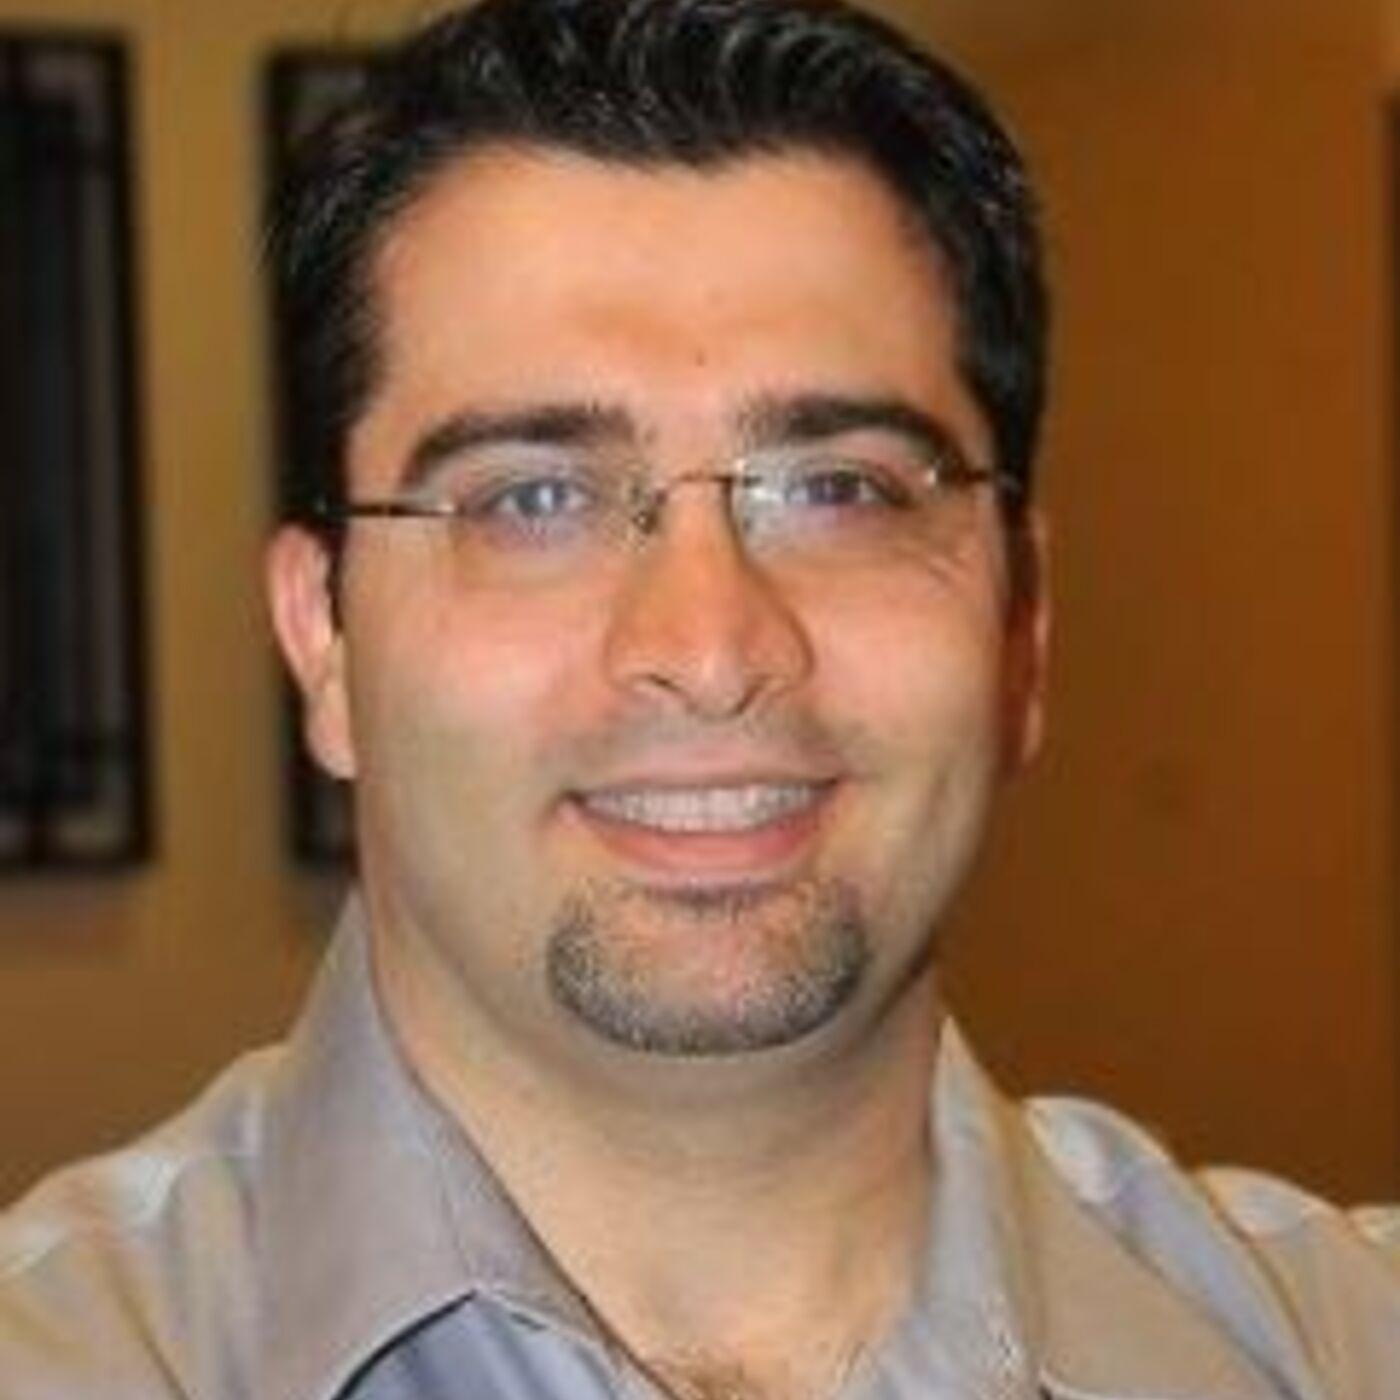 Episode #60 - Dr. Dave Shirazi - Sleep Hygiene - How vital sleep is to improve your health & fitness